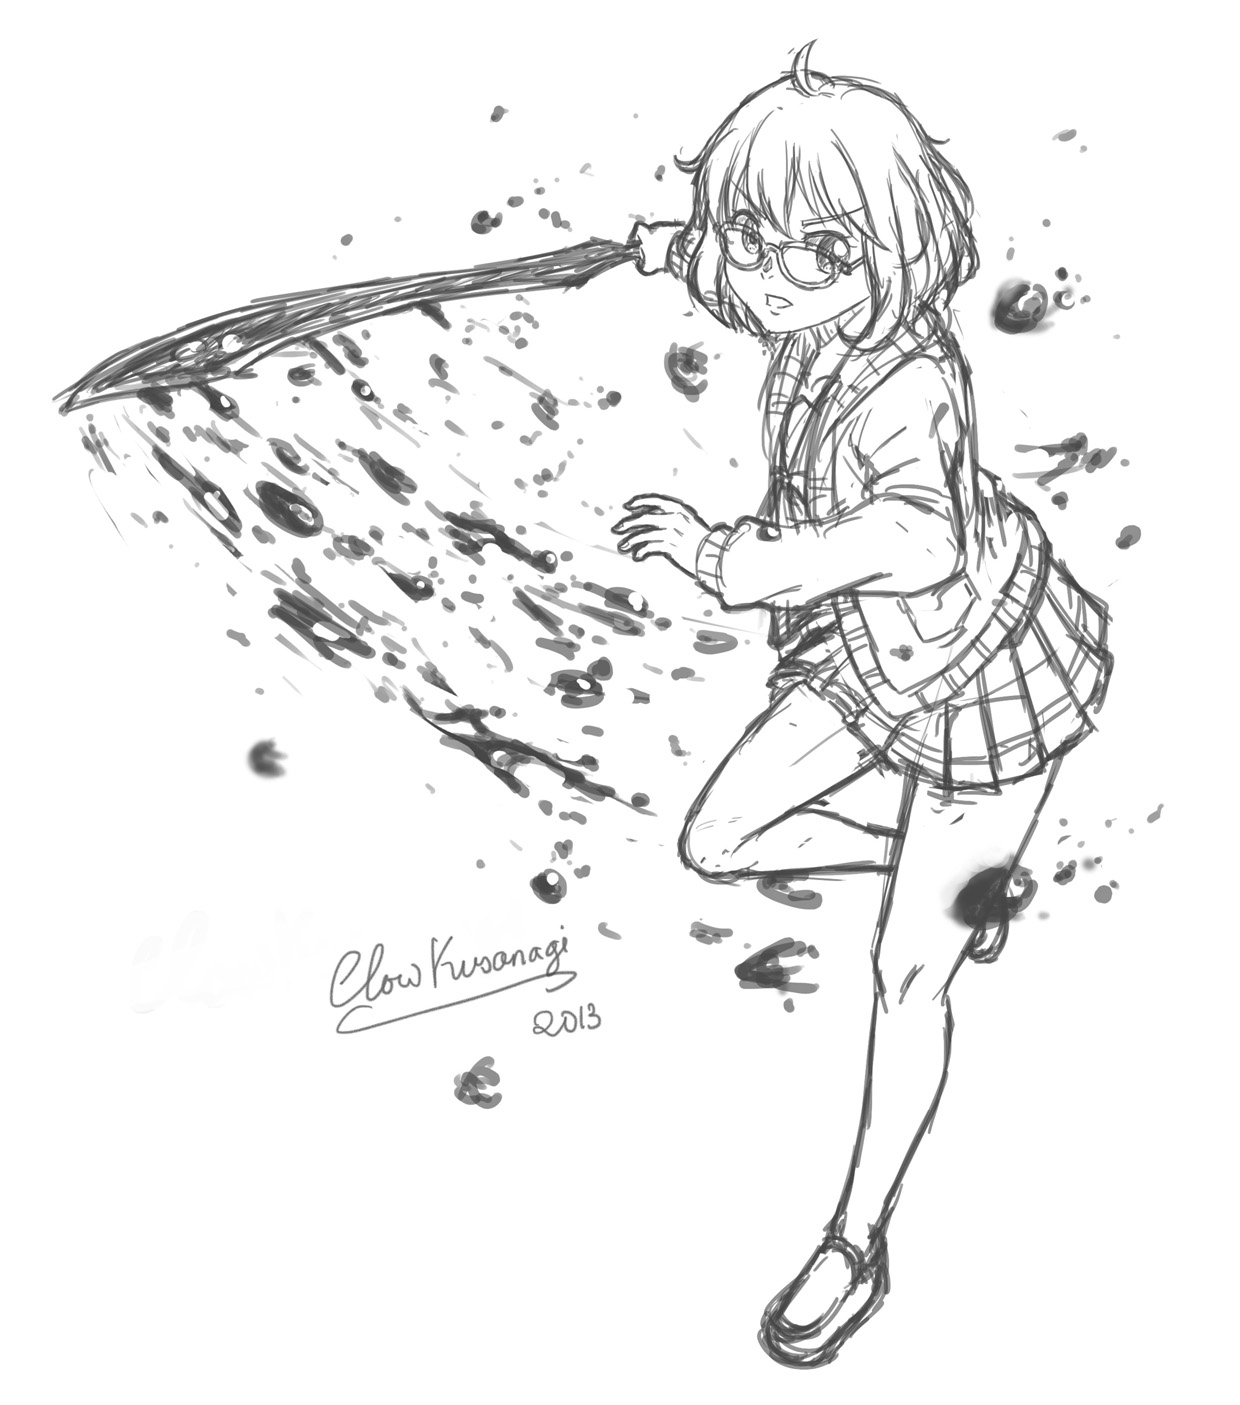 Kyoukai no Kanata - Mirai Kuriyama by ClowKusanagi